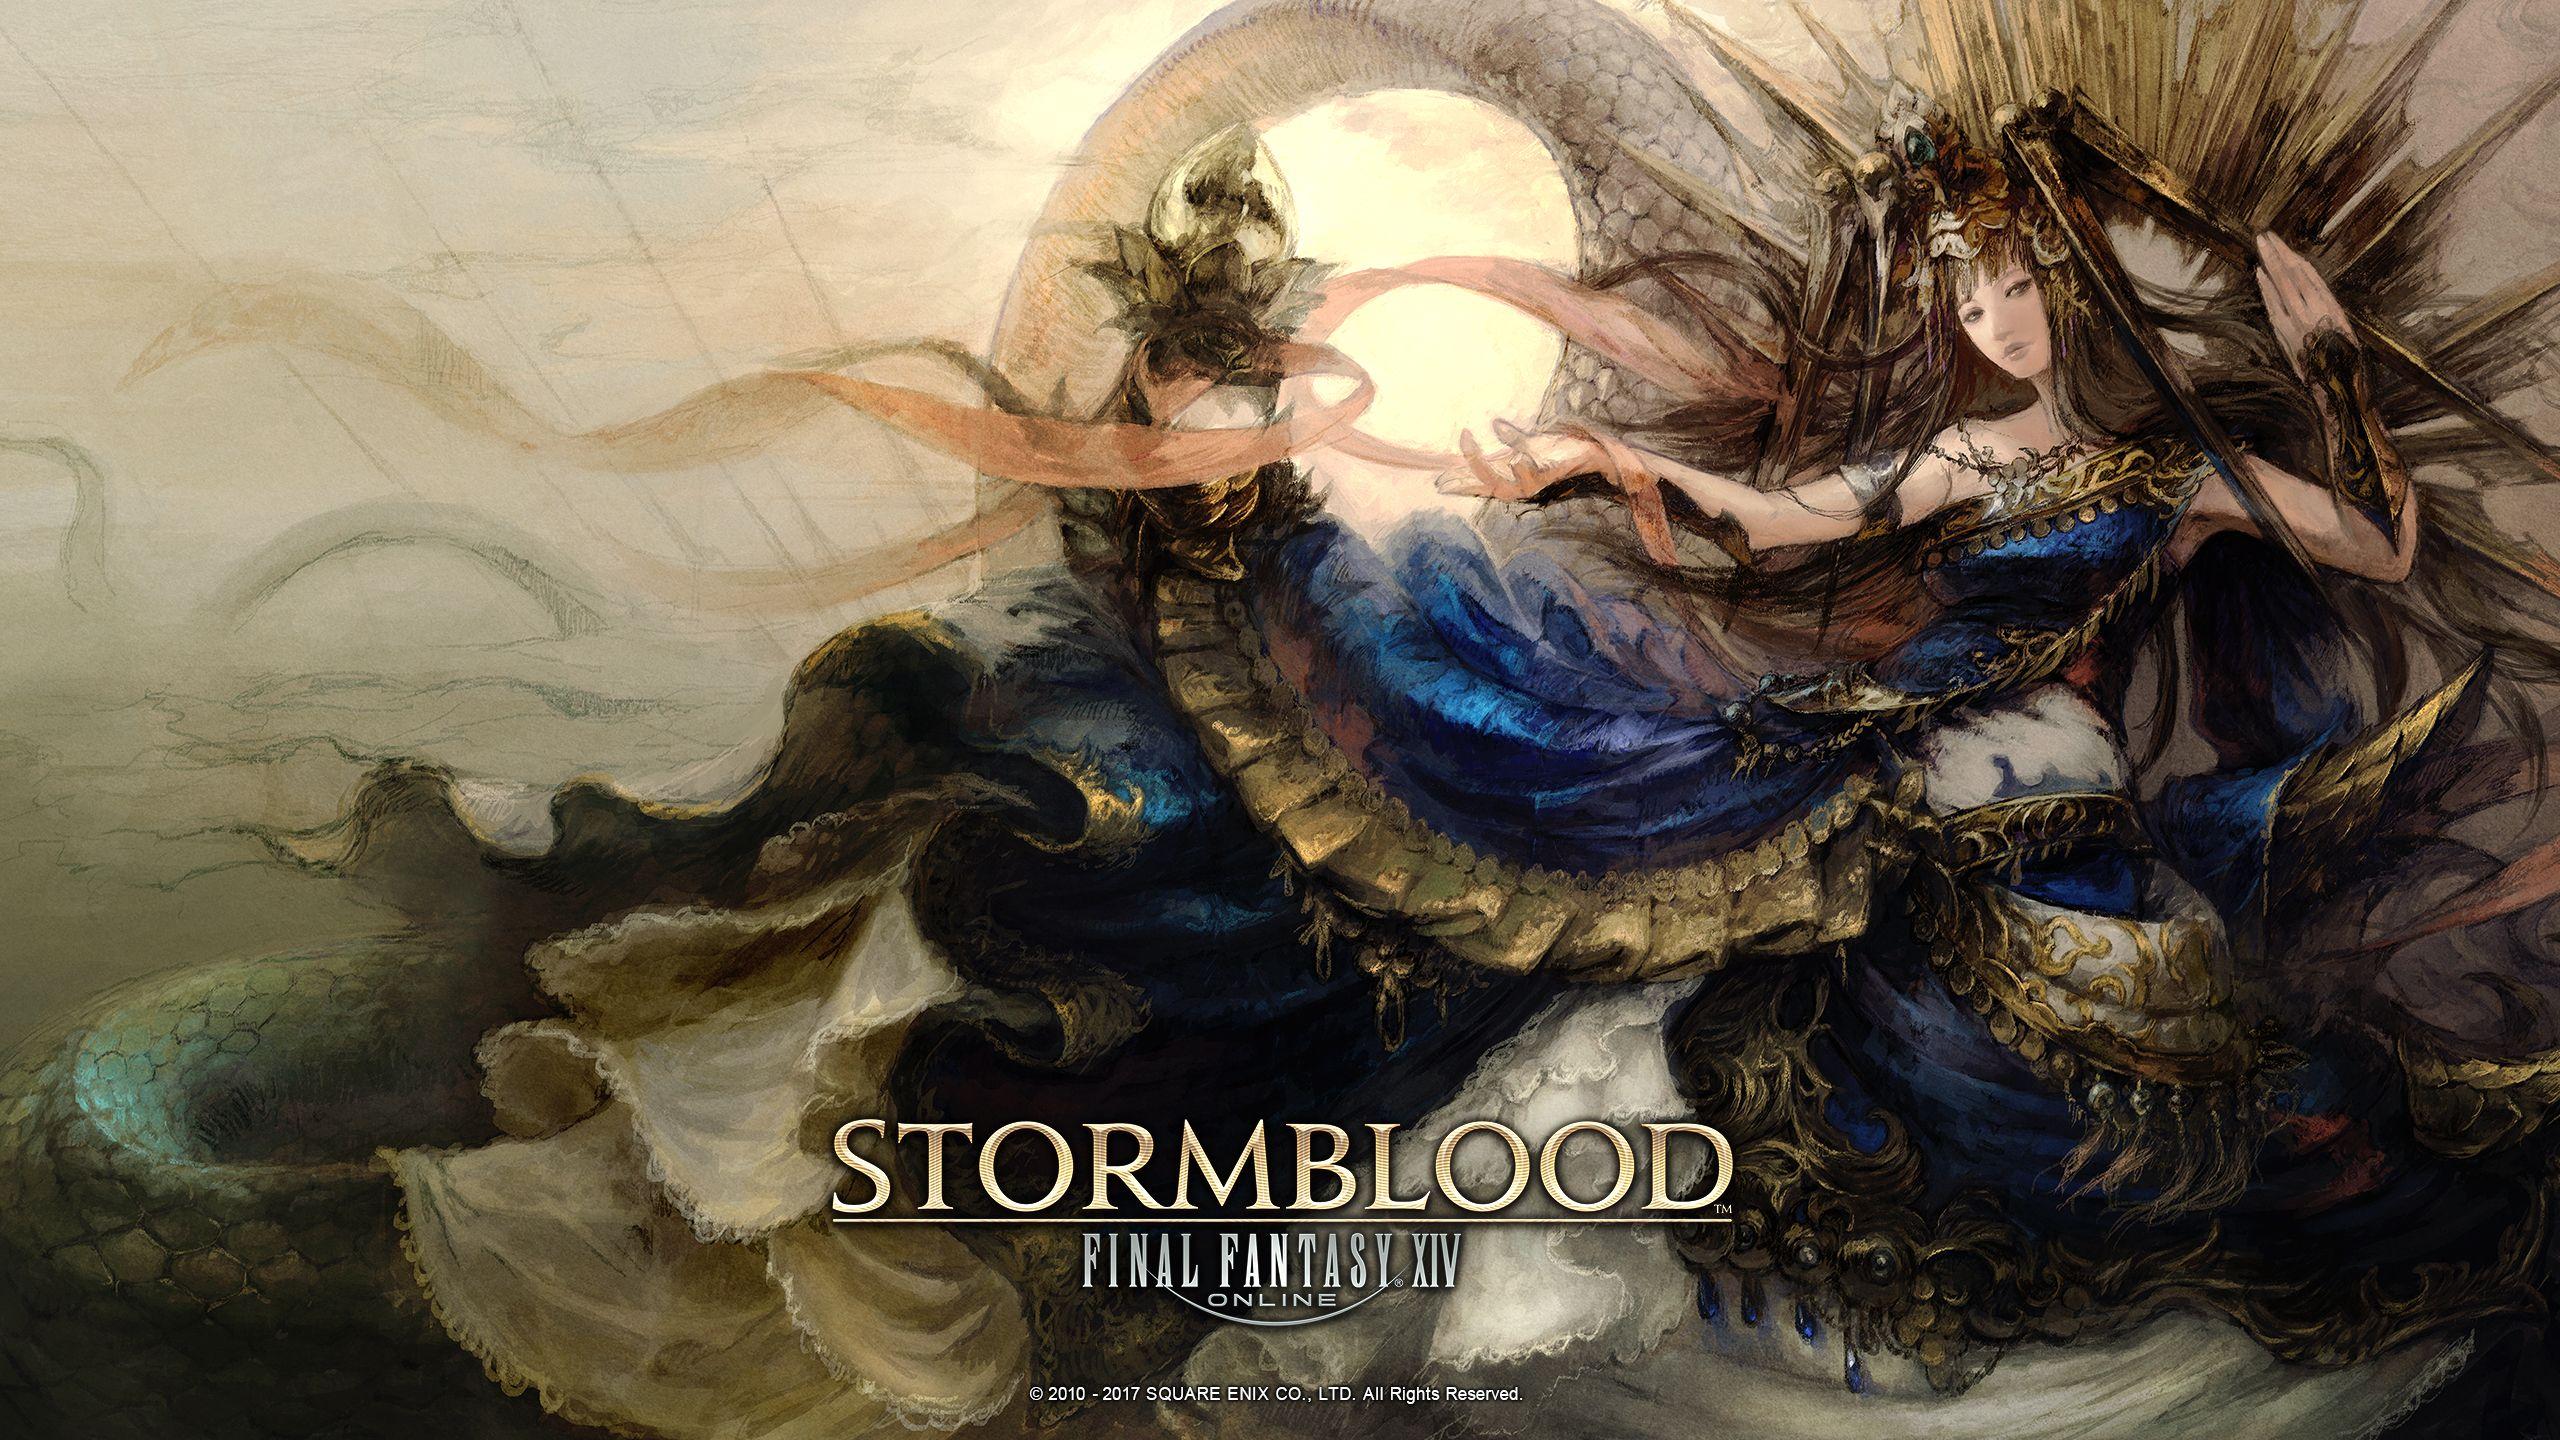 Stormblood Final Fantasy Artwork Final Fantasy Xiv Final